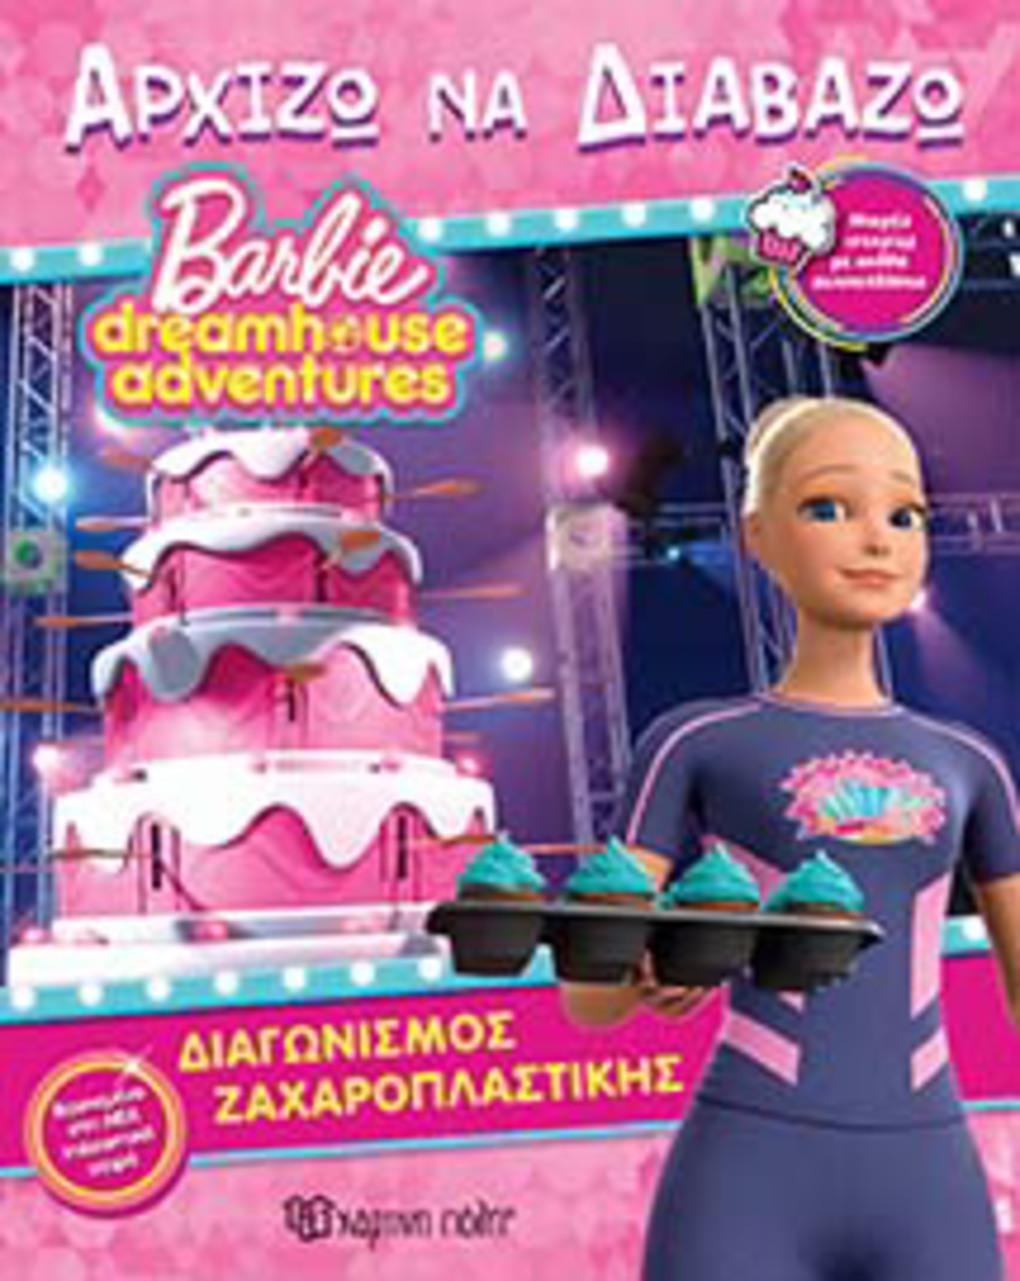 Barbie Dreamhouse Adventures-Αρχίζω να Διαβάζω 11-Διαγωνισμός Ζαχαροπλαστικής